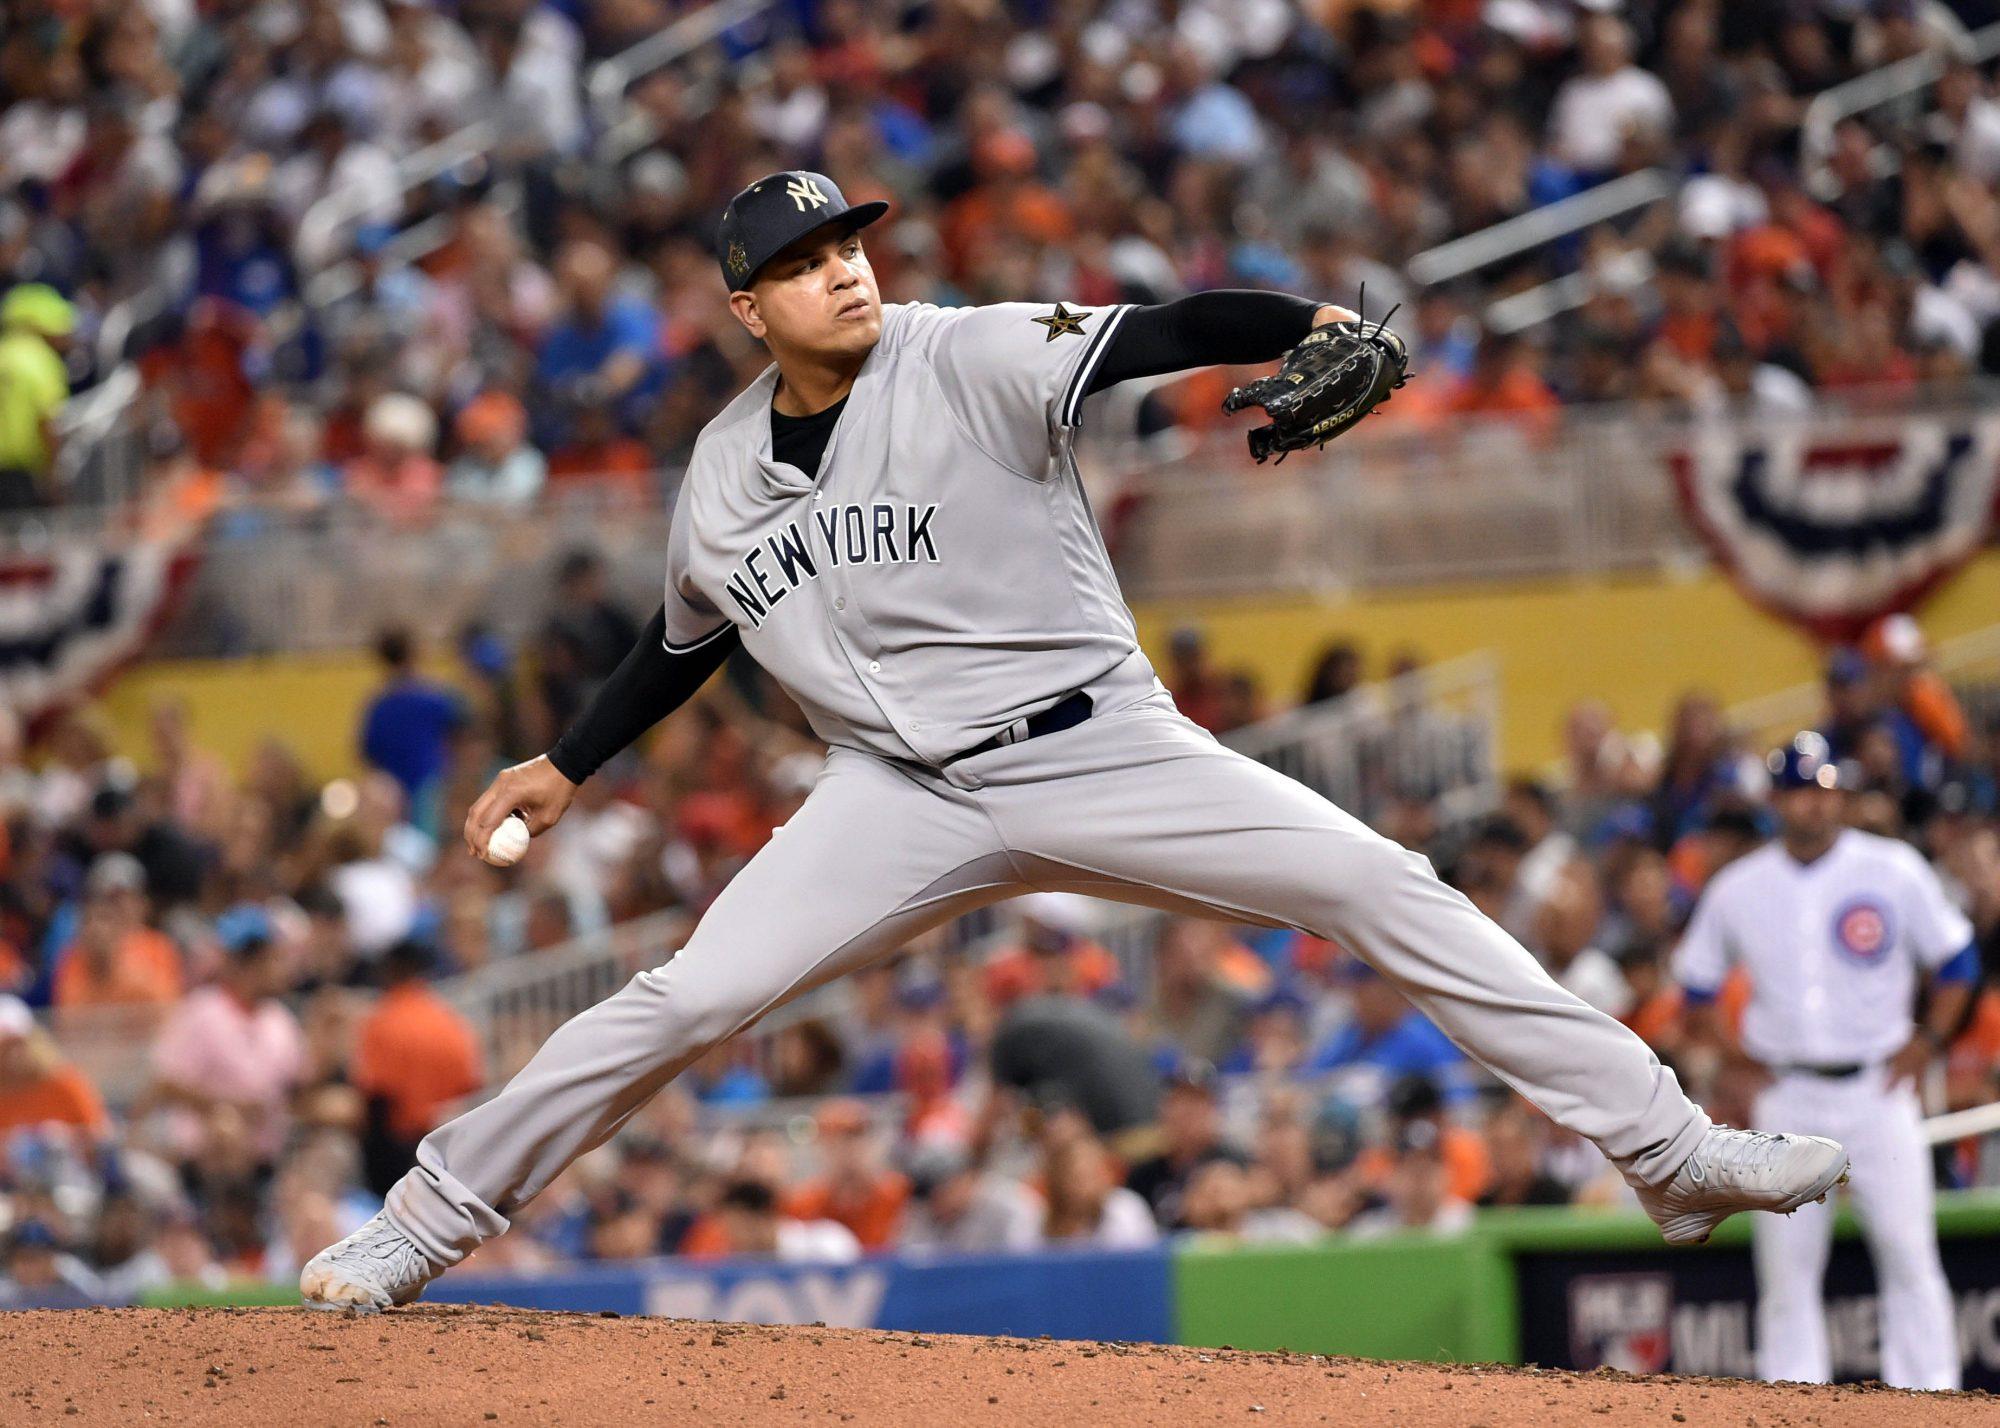 New York Yankees: Cashman Clarifies The Availability Of Dellin Betances